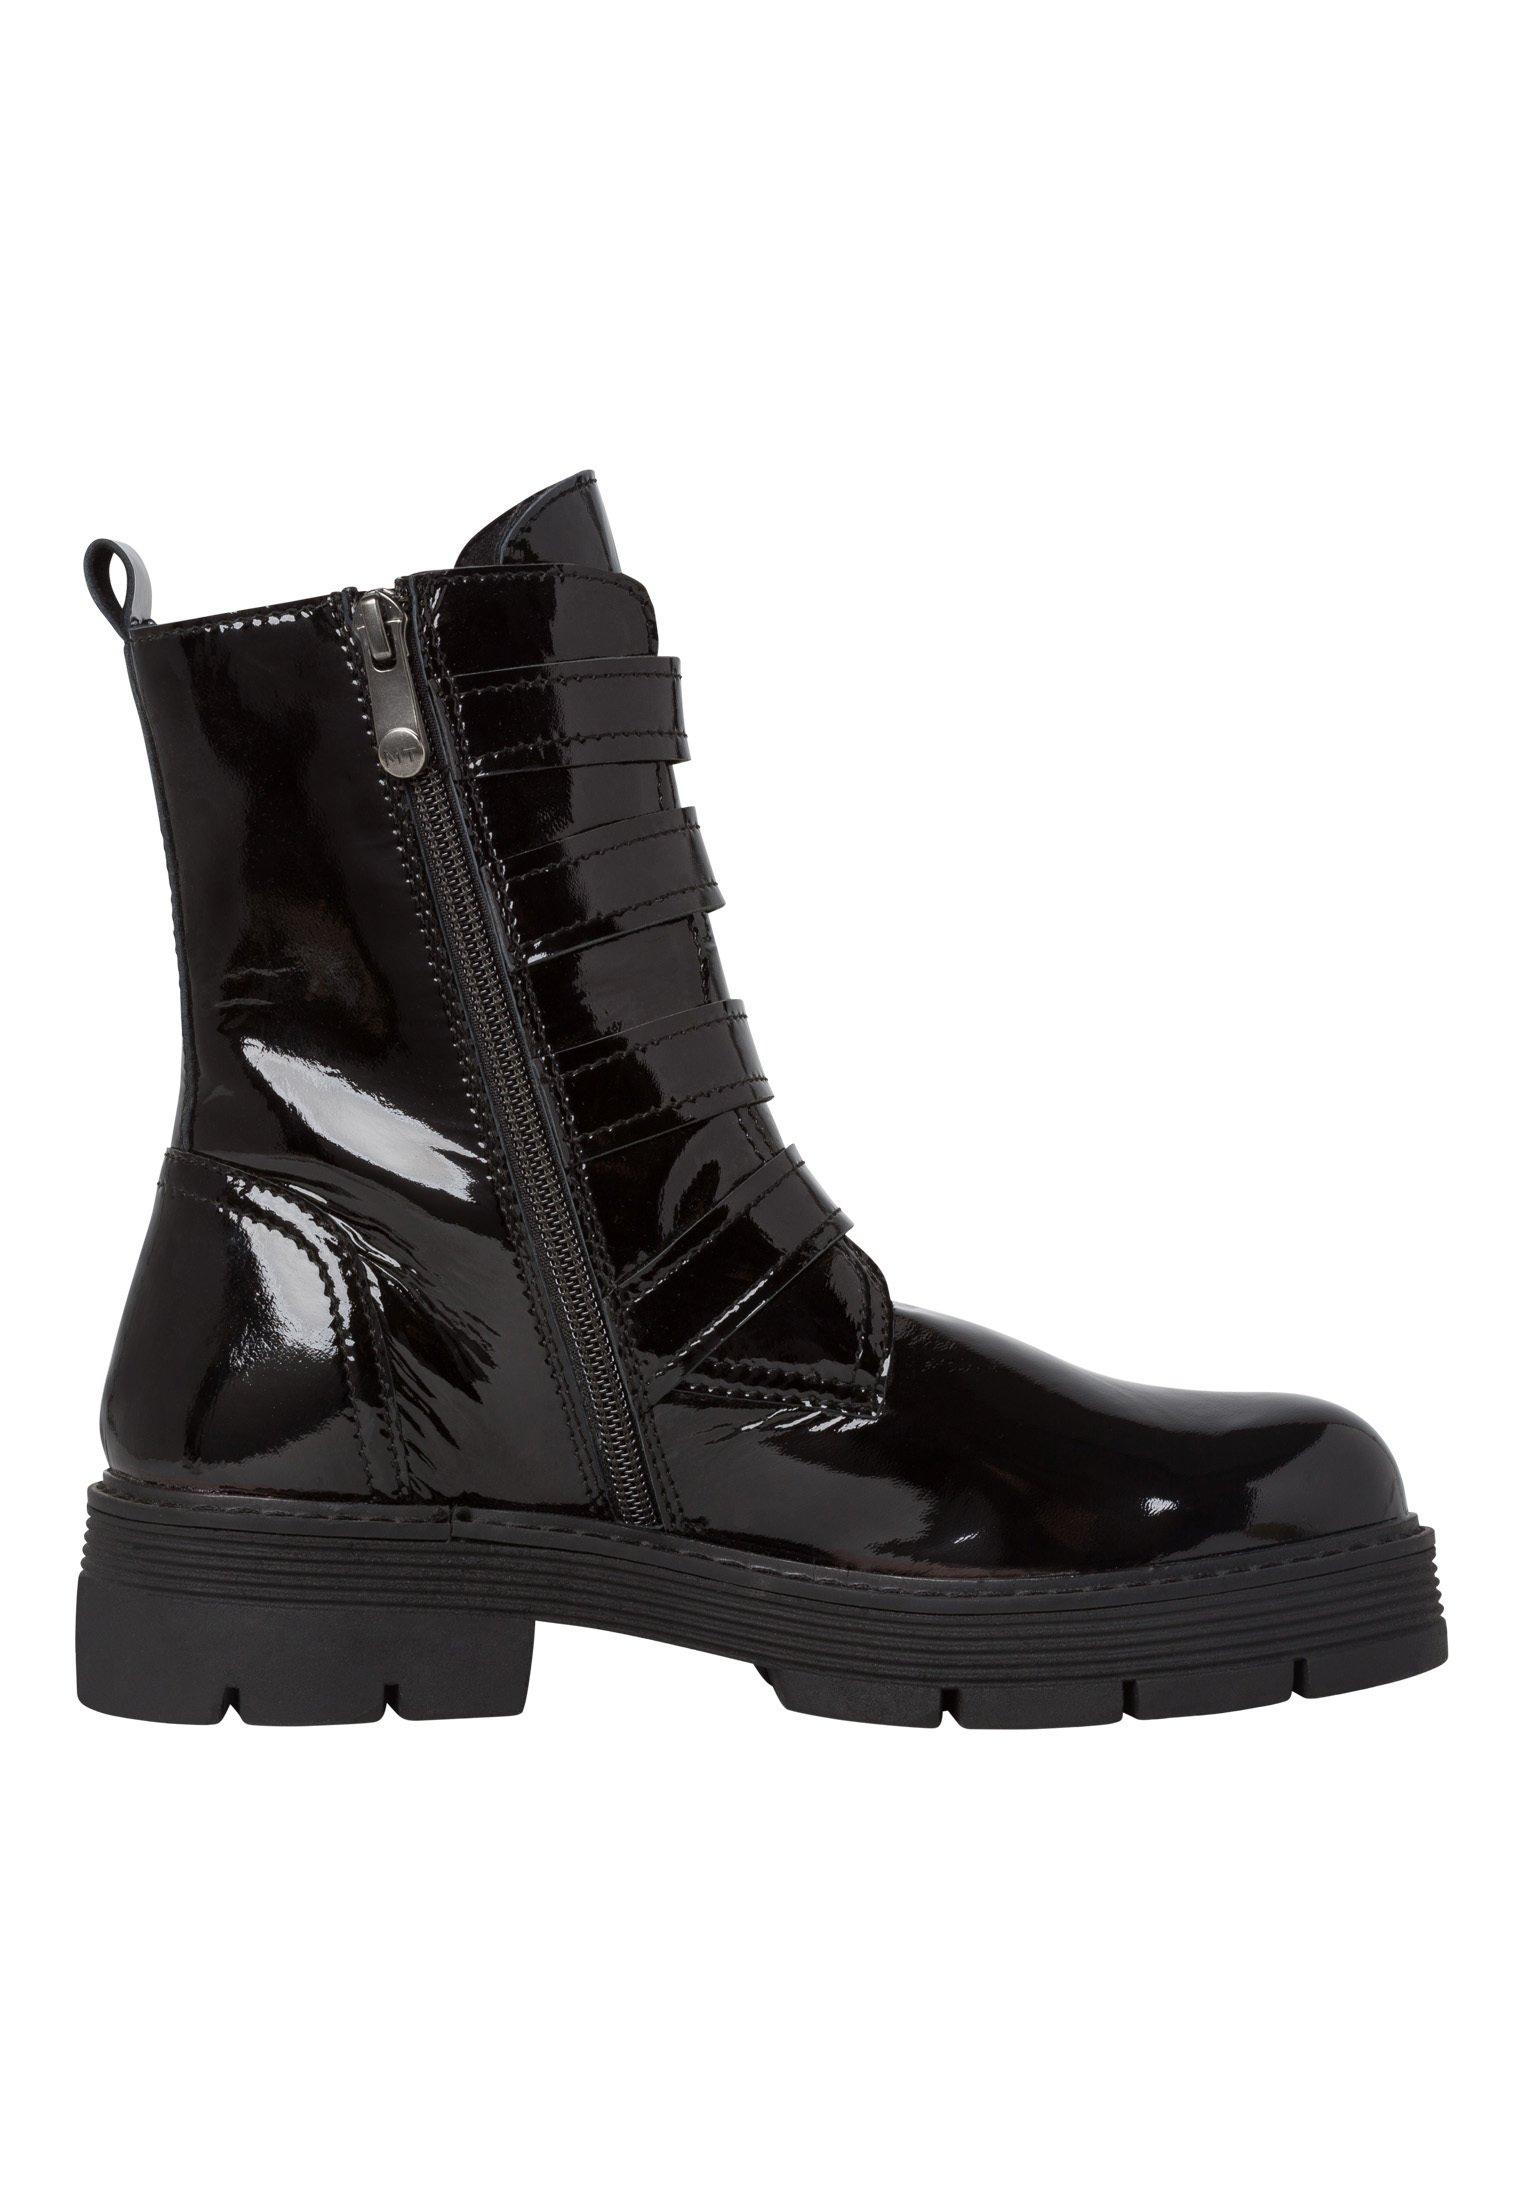 Marco Tozzi STIEFELETTE Cowboy/Bikerstiefelette black patent/schwarz